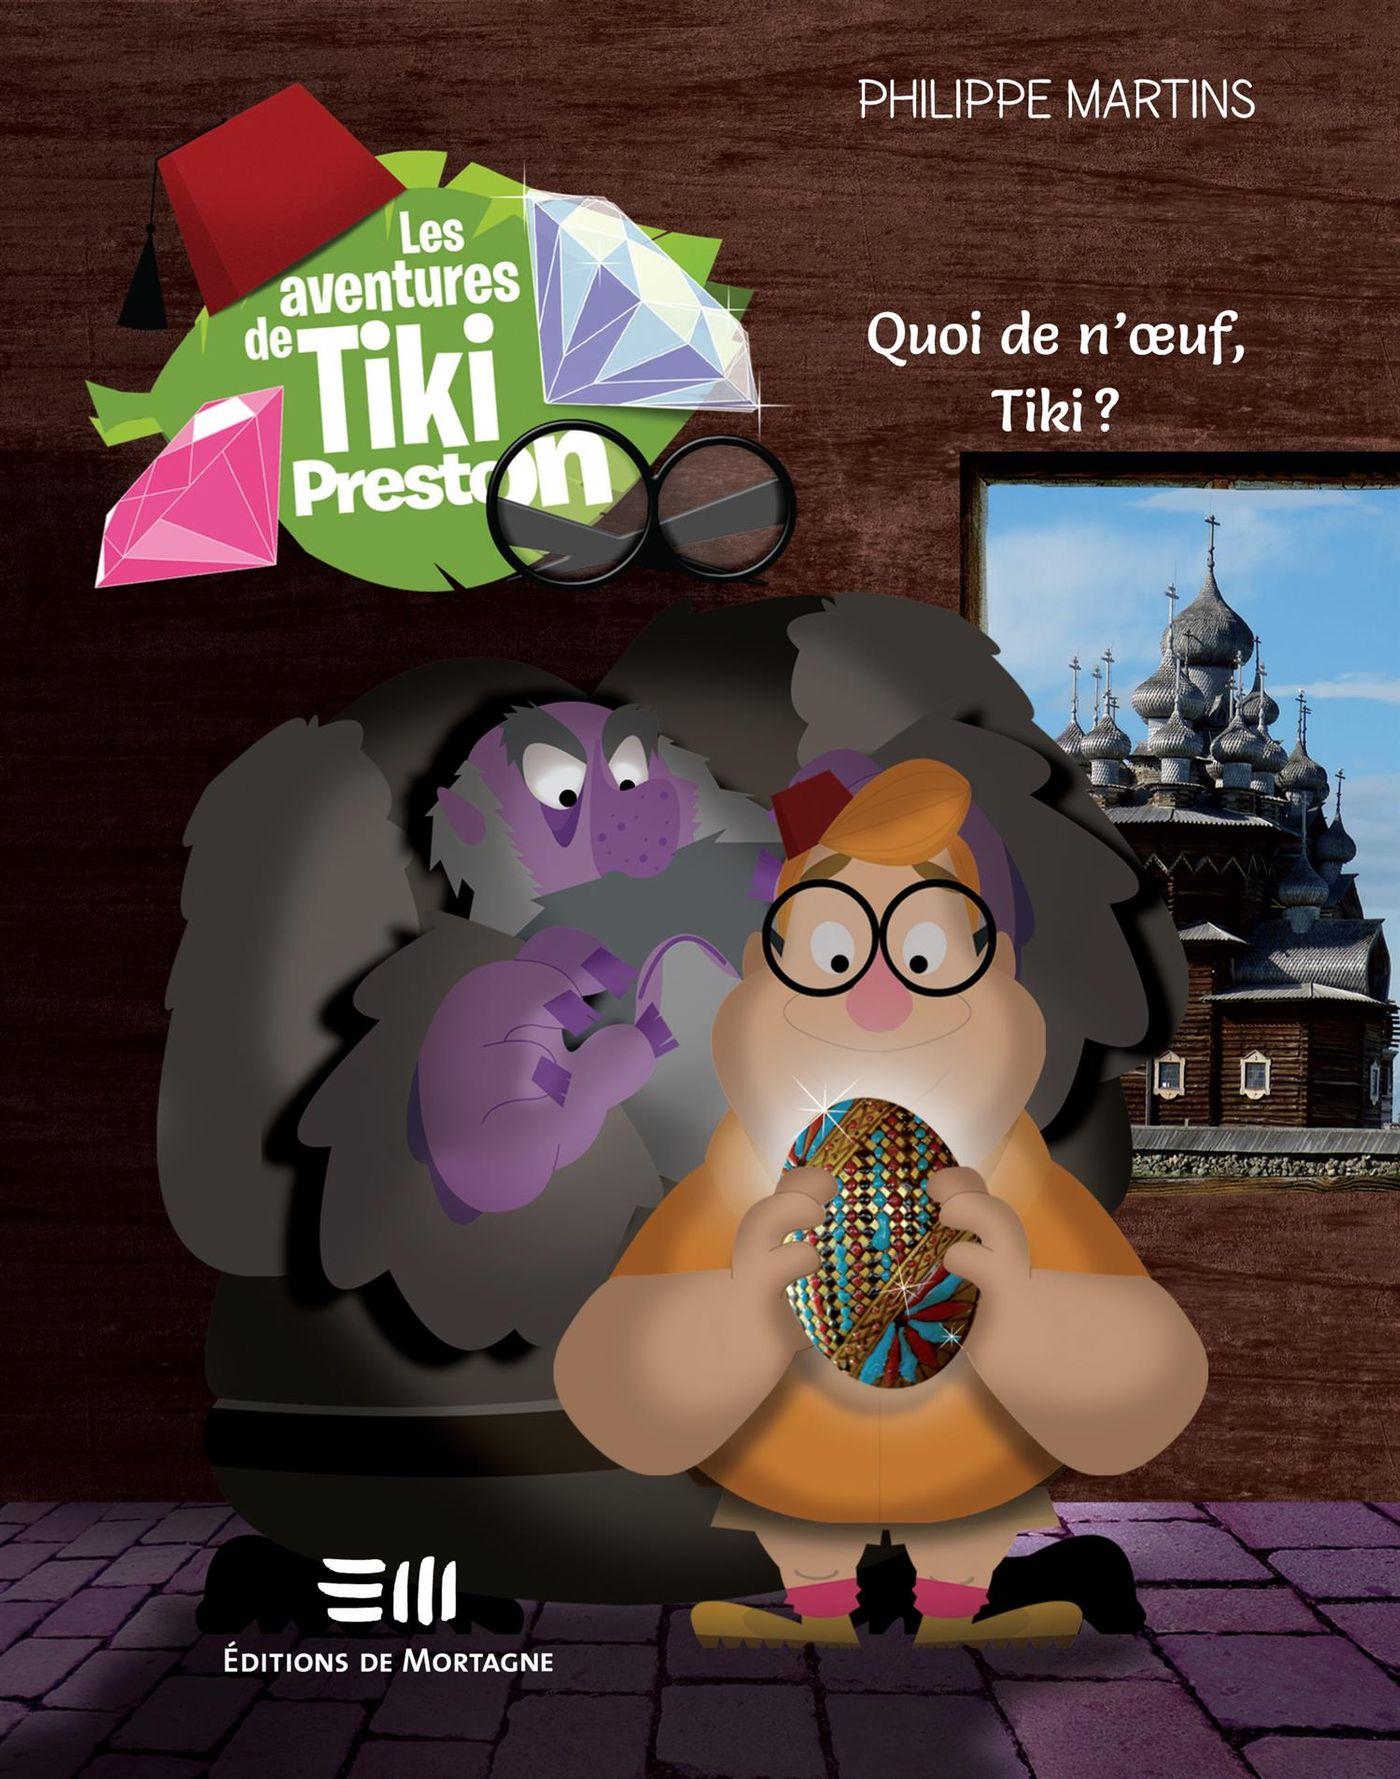 Les aventures de Tiki Preston 02 : Quoi de n'oeuf, Tiki ?